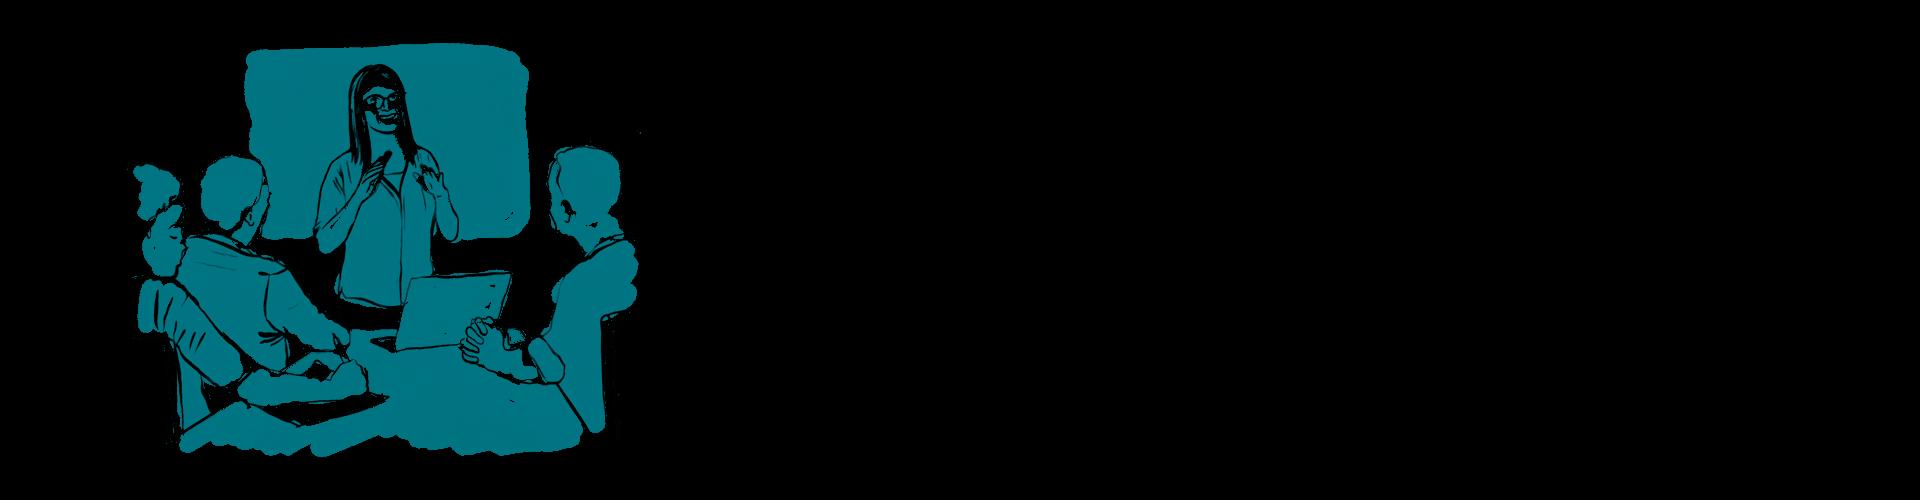 Kira-Daldrop_Stage-Pädagogische Fortbildung